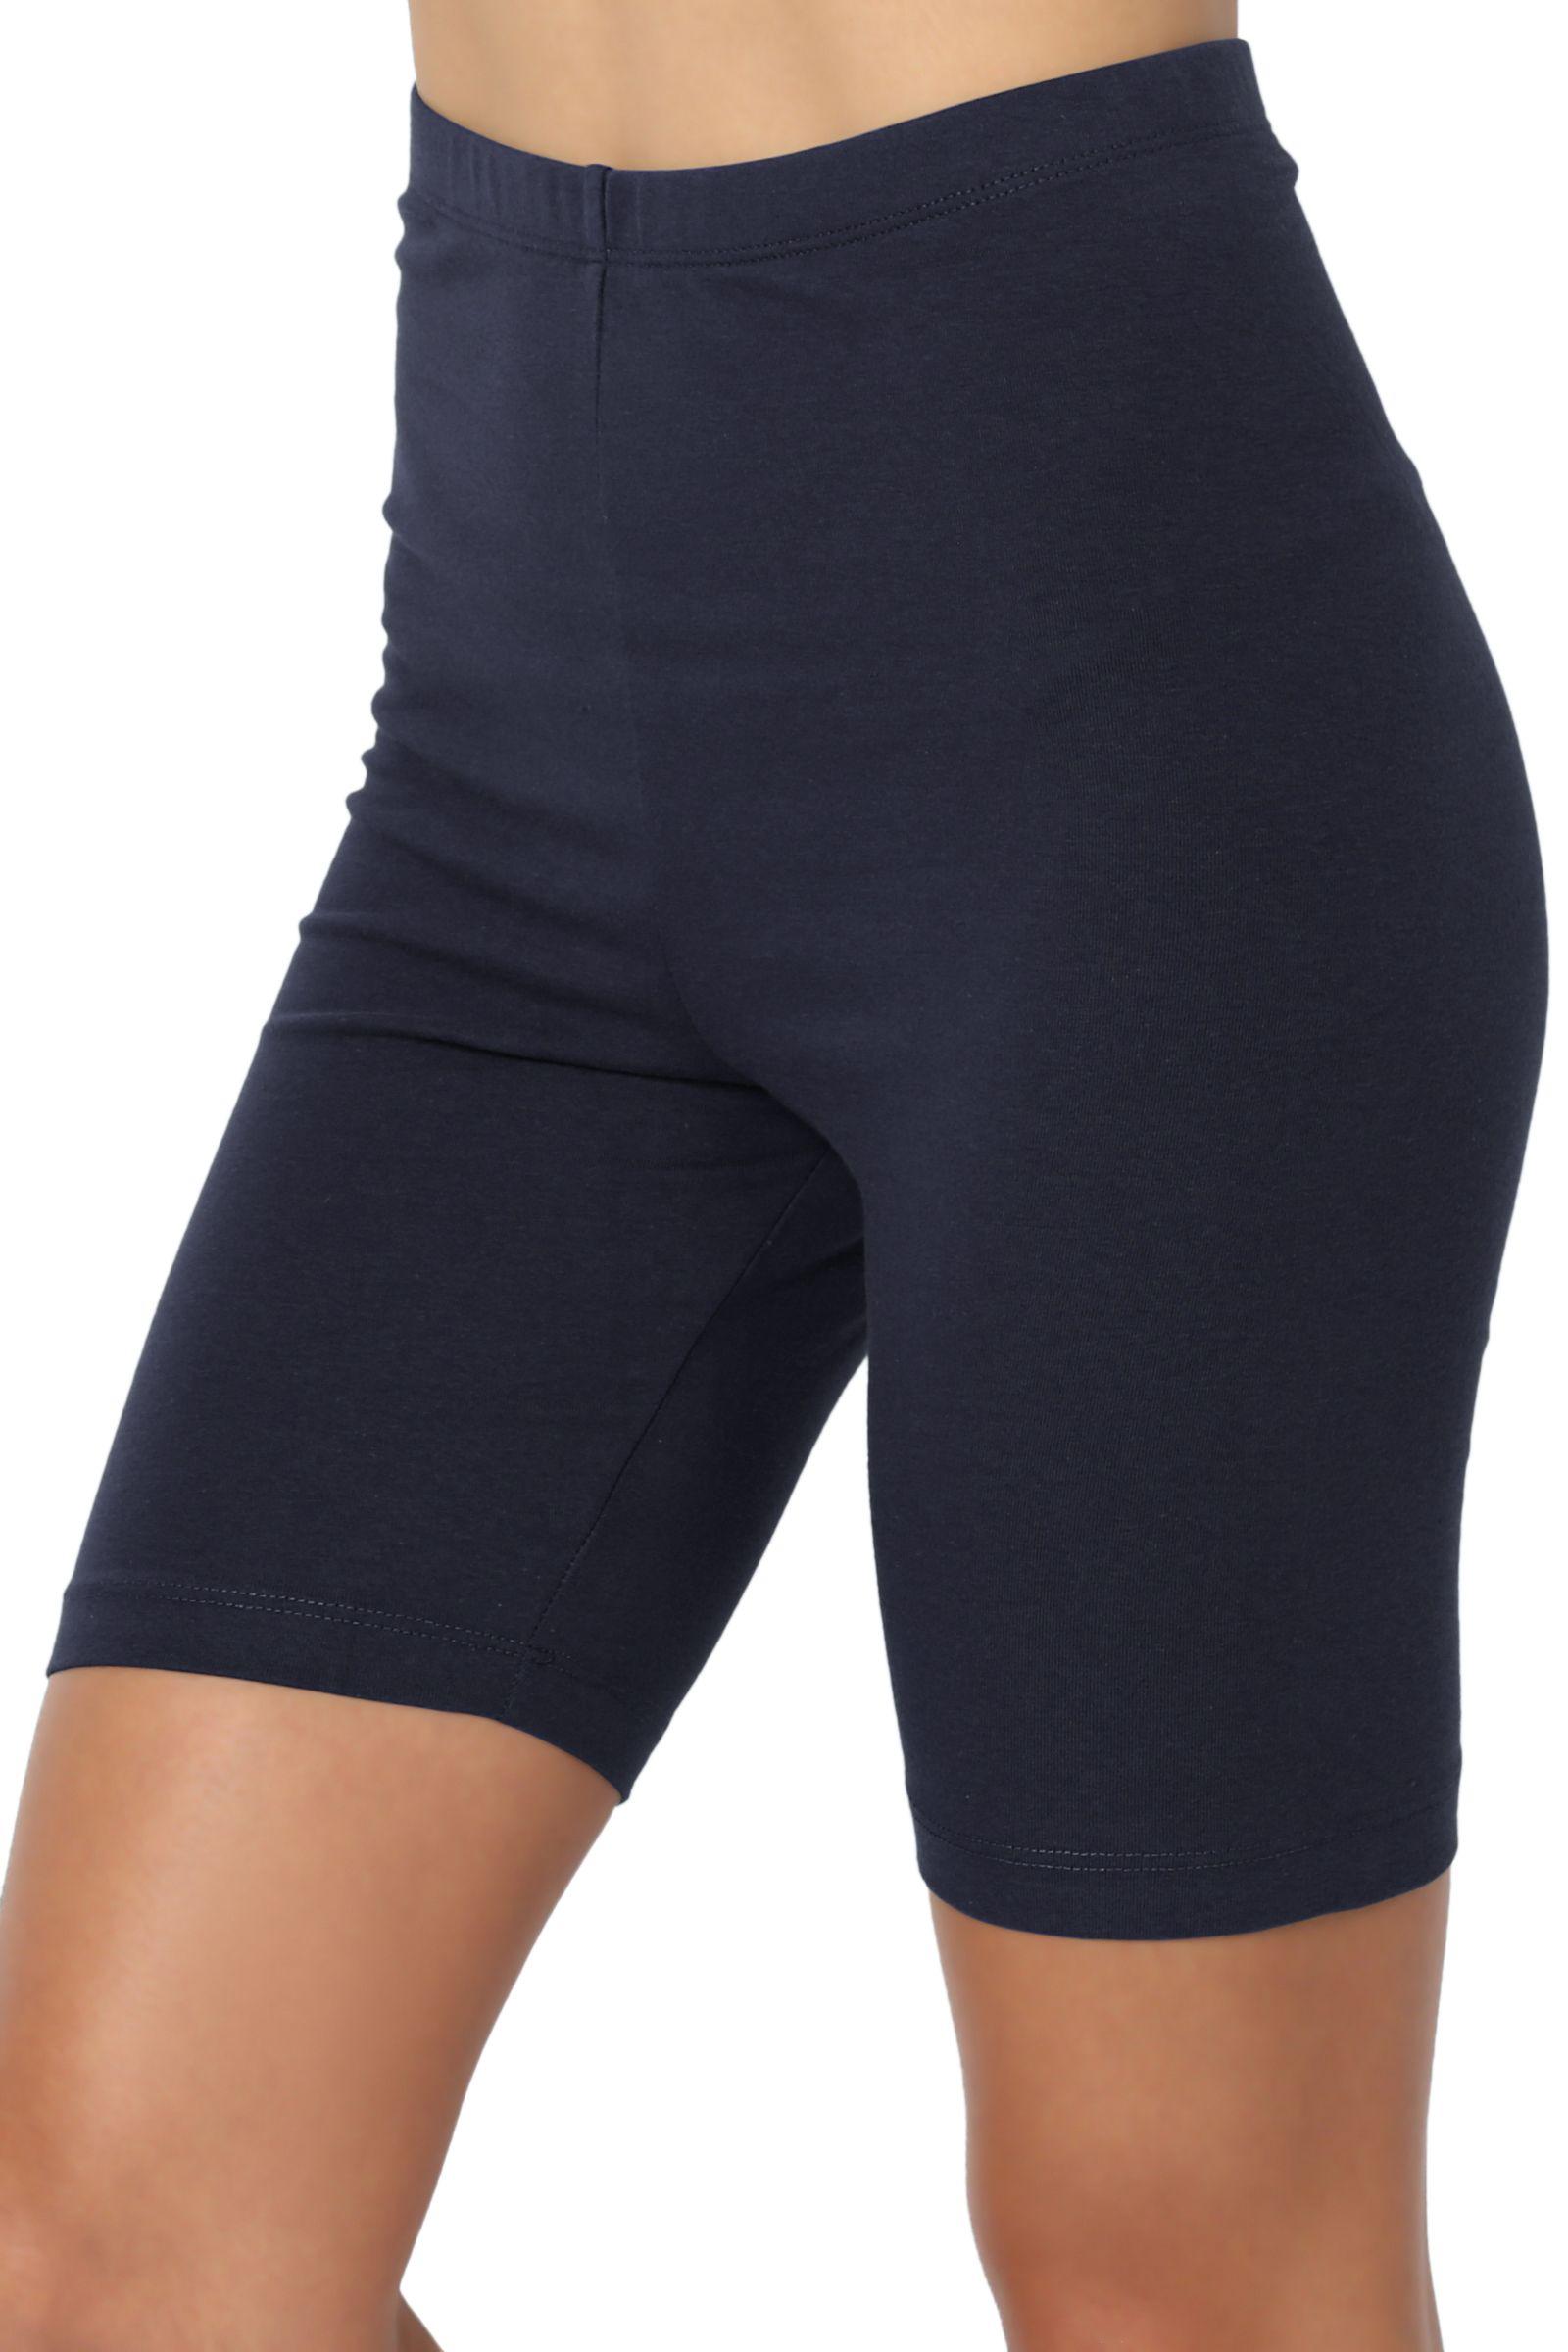 5bd6298e5b1f0d Buy TheMogan Women's S~3X Mid Thigh Stretch Cotton Active Bermuda Under  Short Leggings at Walmart.com